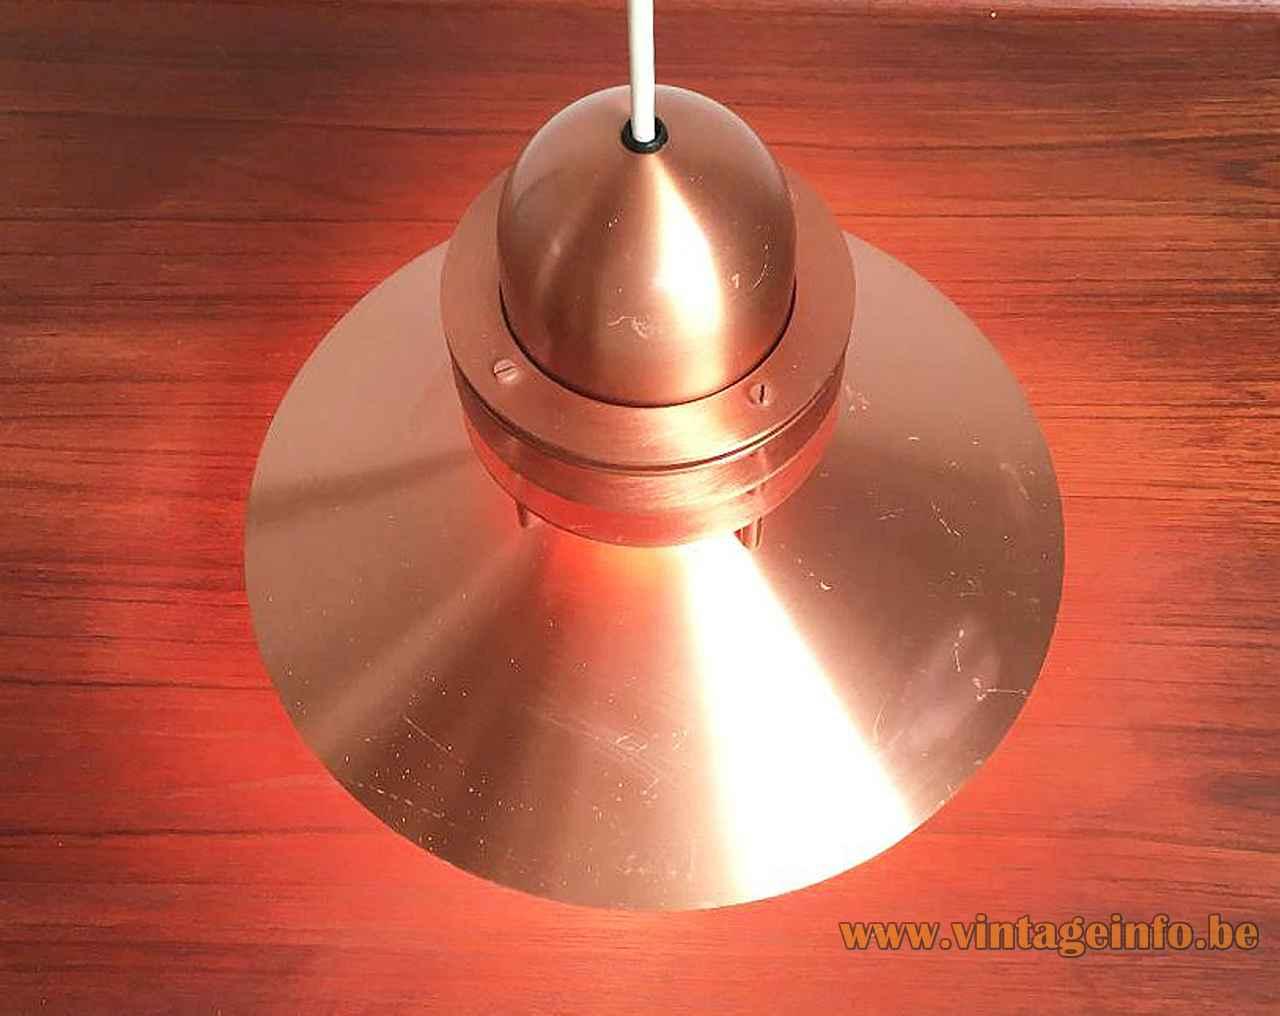 Louis Poulsen Nyhavn pendant lamp copper lampshade rings design: Alfred Homann Denmark top view 1970s 1980s